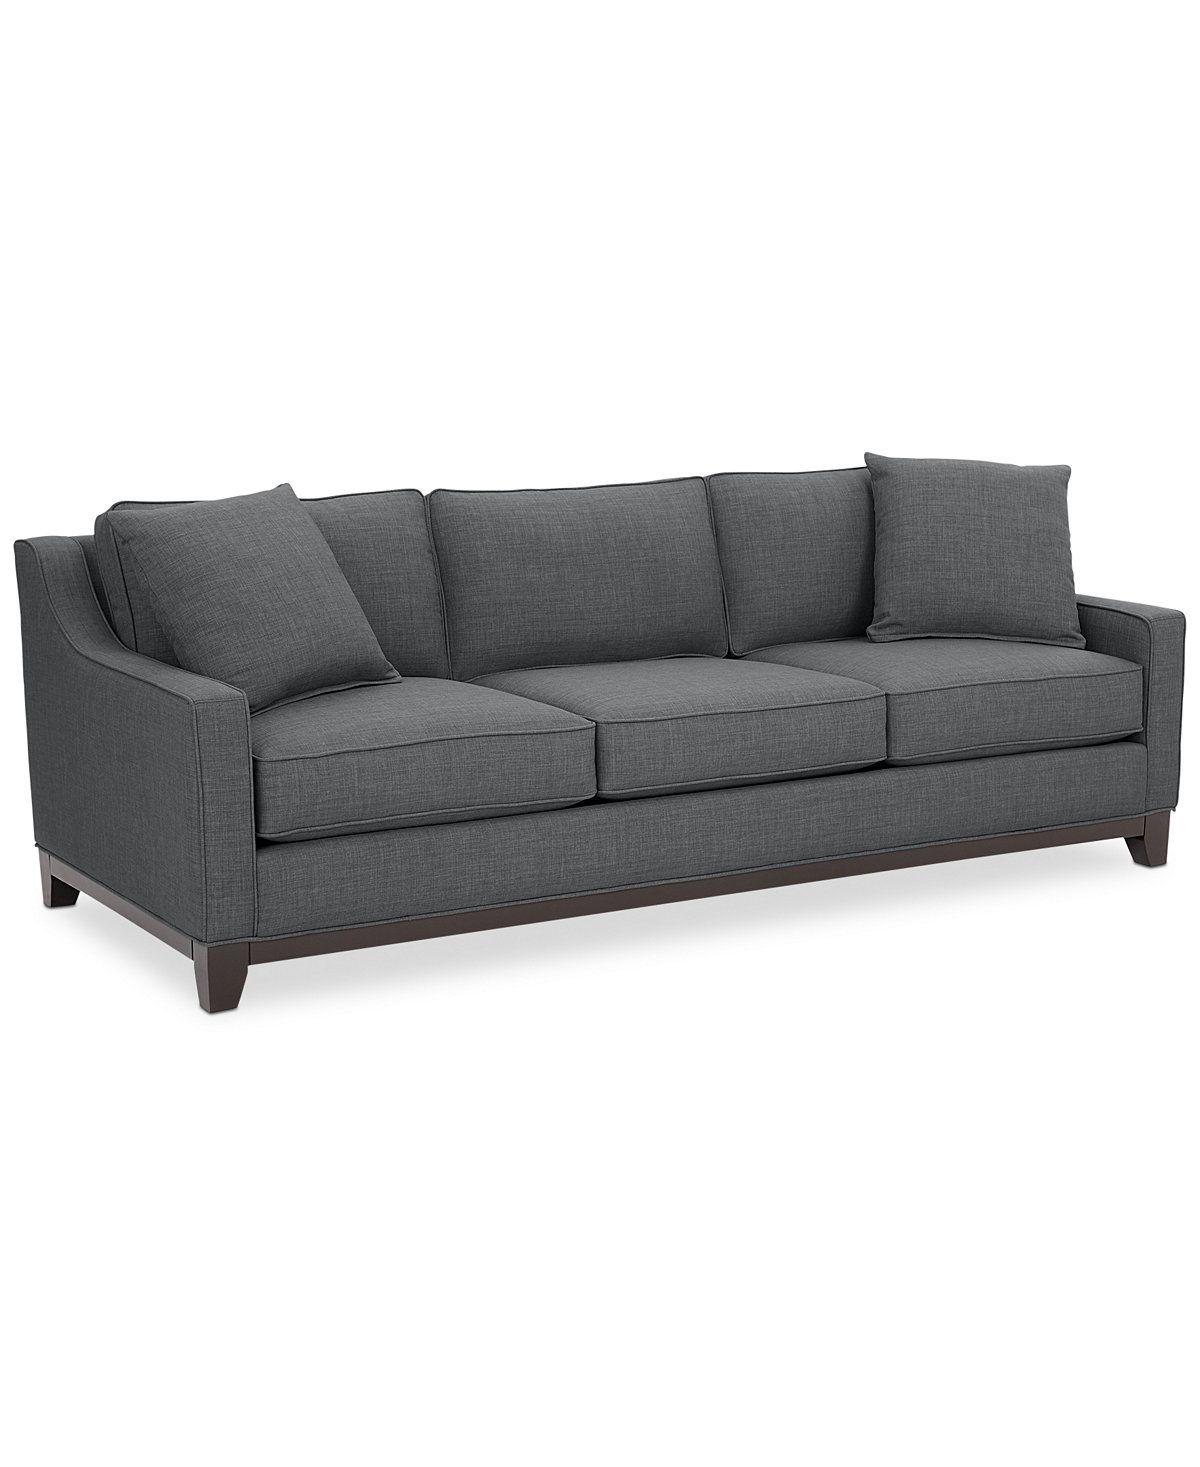 Furniture Keegan 90 Fabric Sofa Created For Macy S Reviews